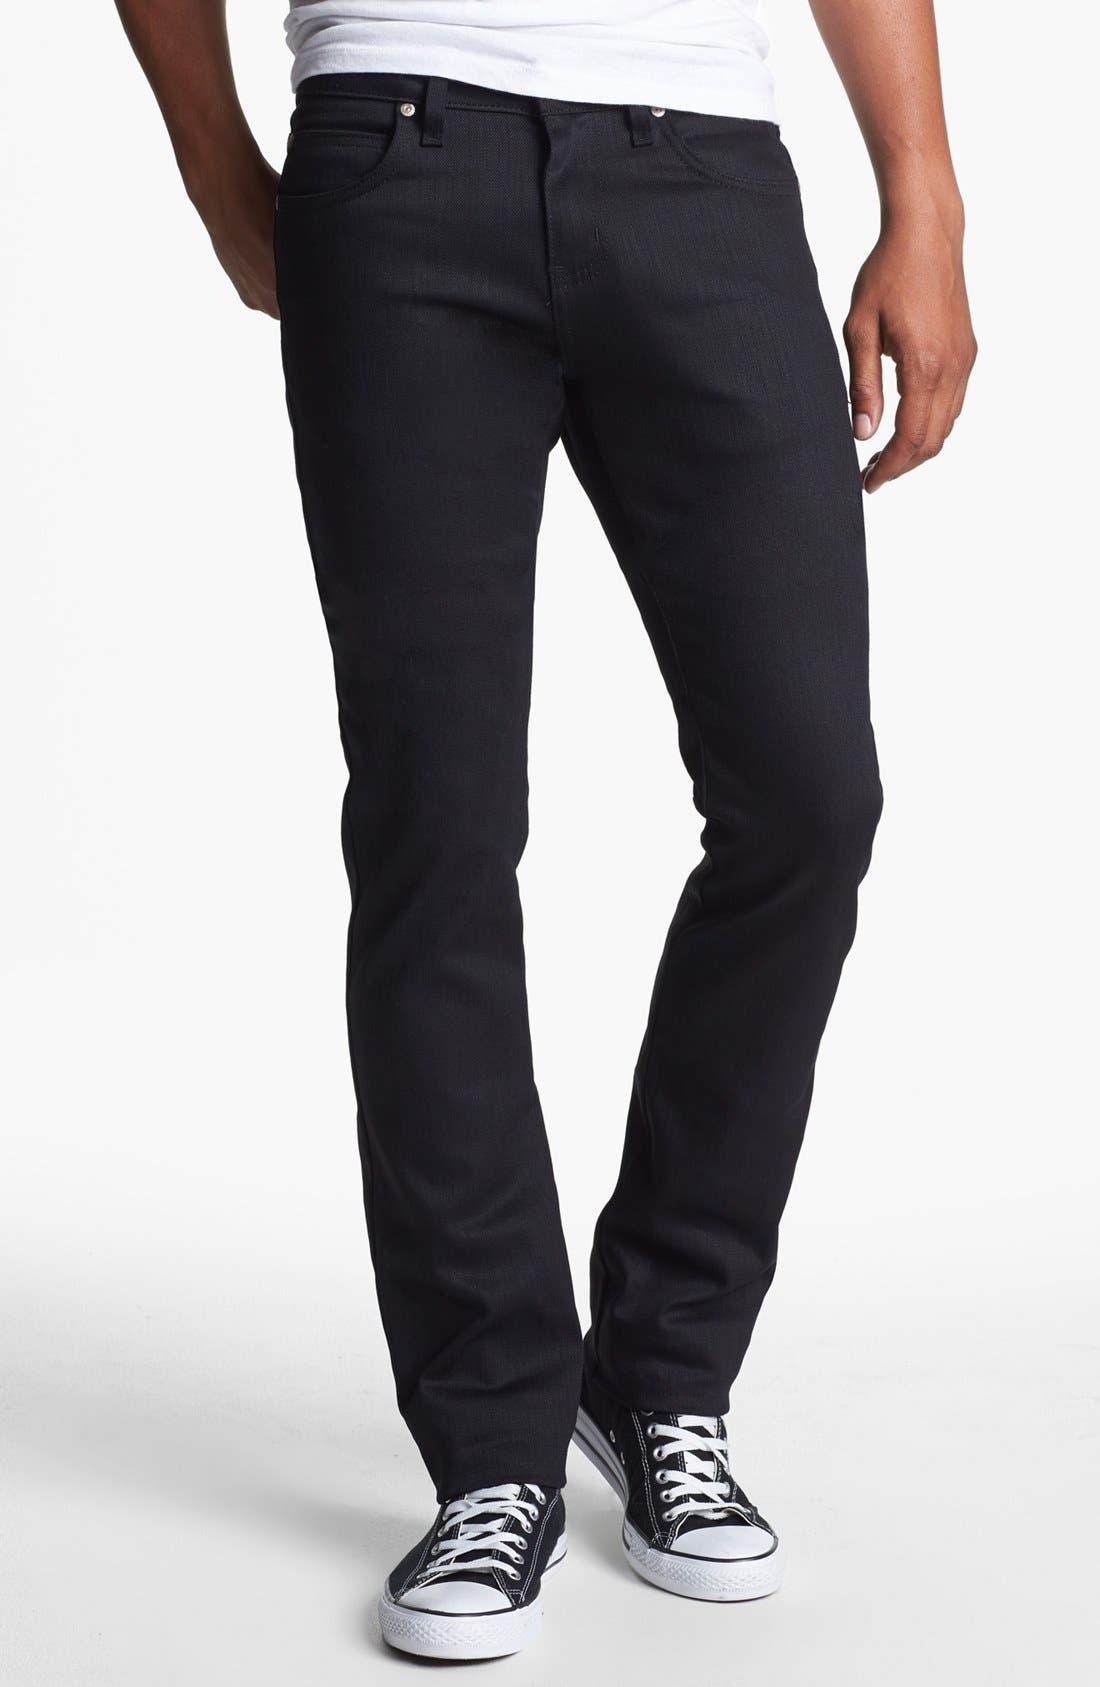 Skinny Guy Skinny Fit Jeans,                         Main,                         color, Black Power Stretch